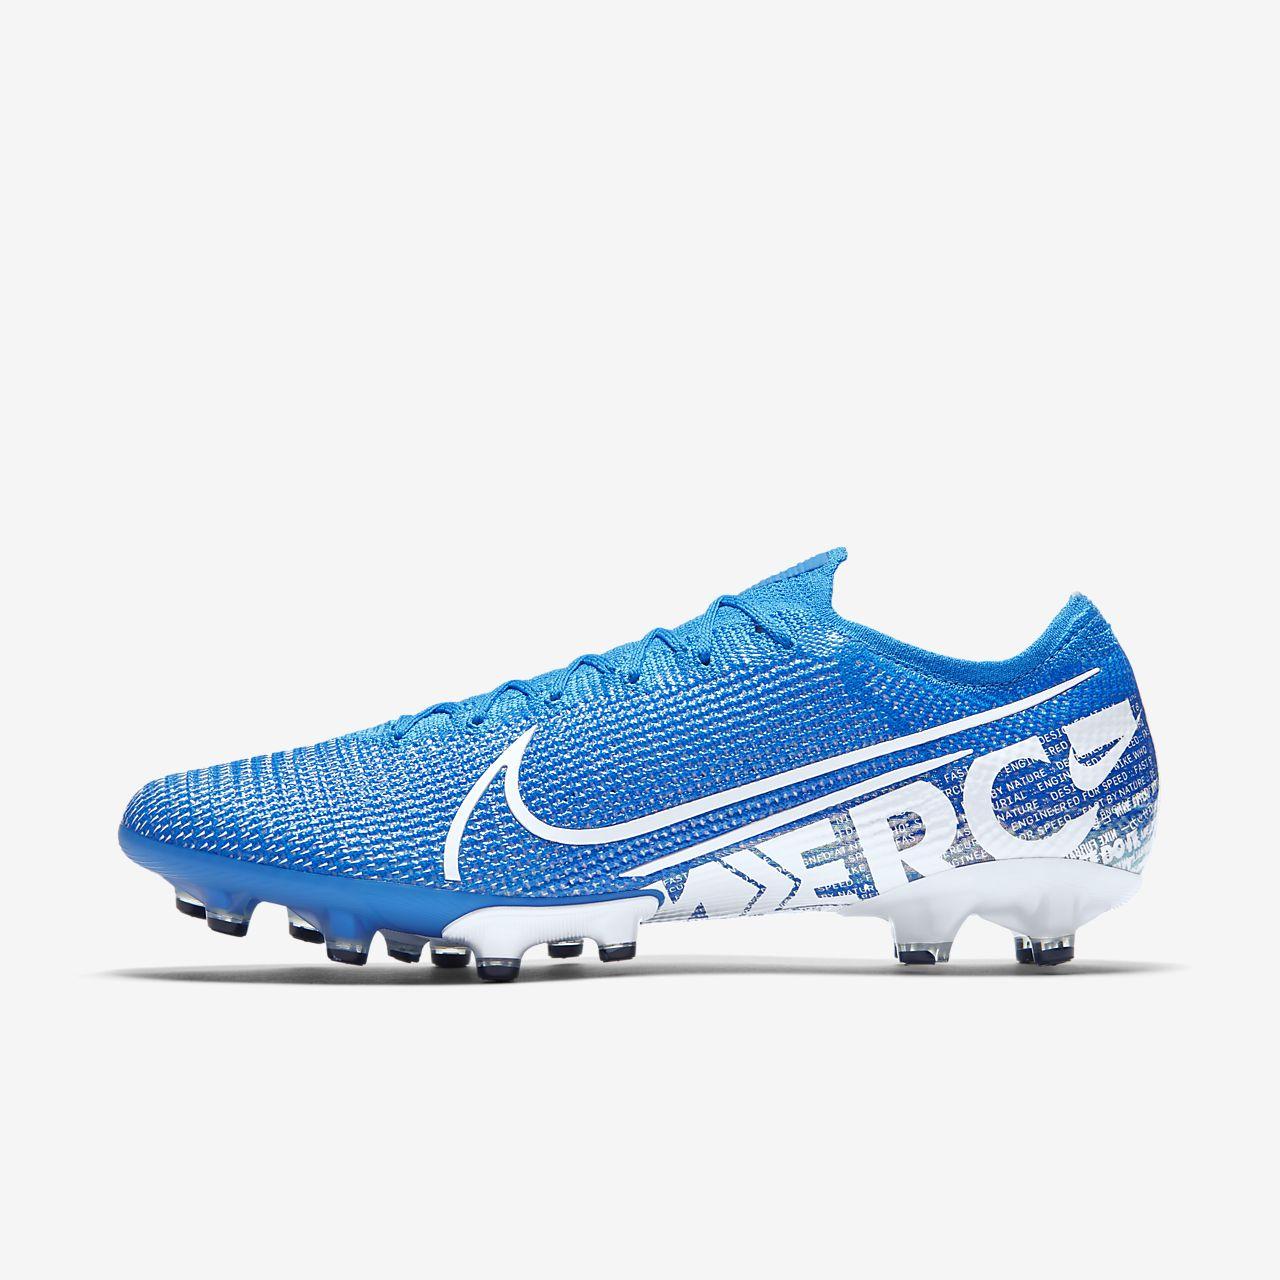 Scarpa da calcio per erba artificiale Nike Mercurial Vapor 13 Elite AG-PRO